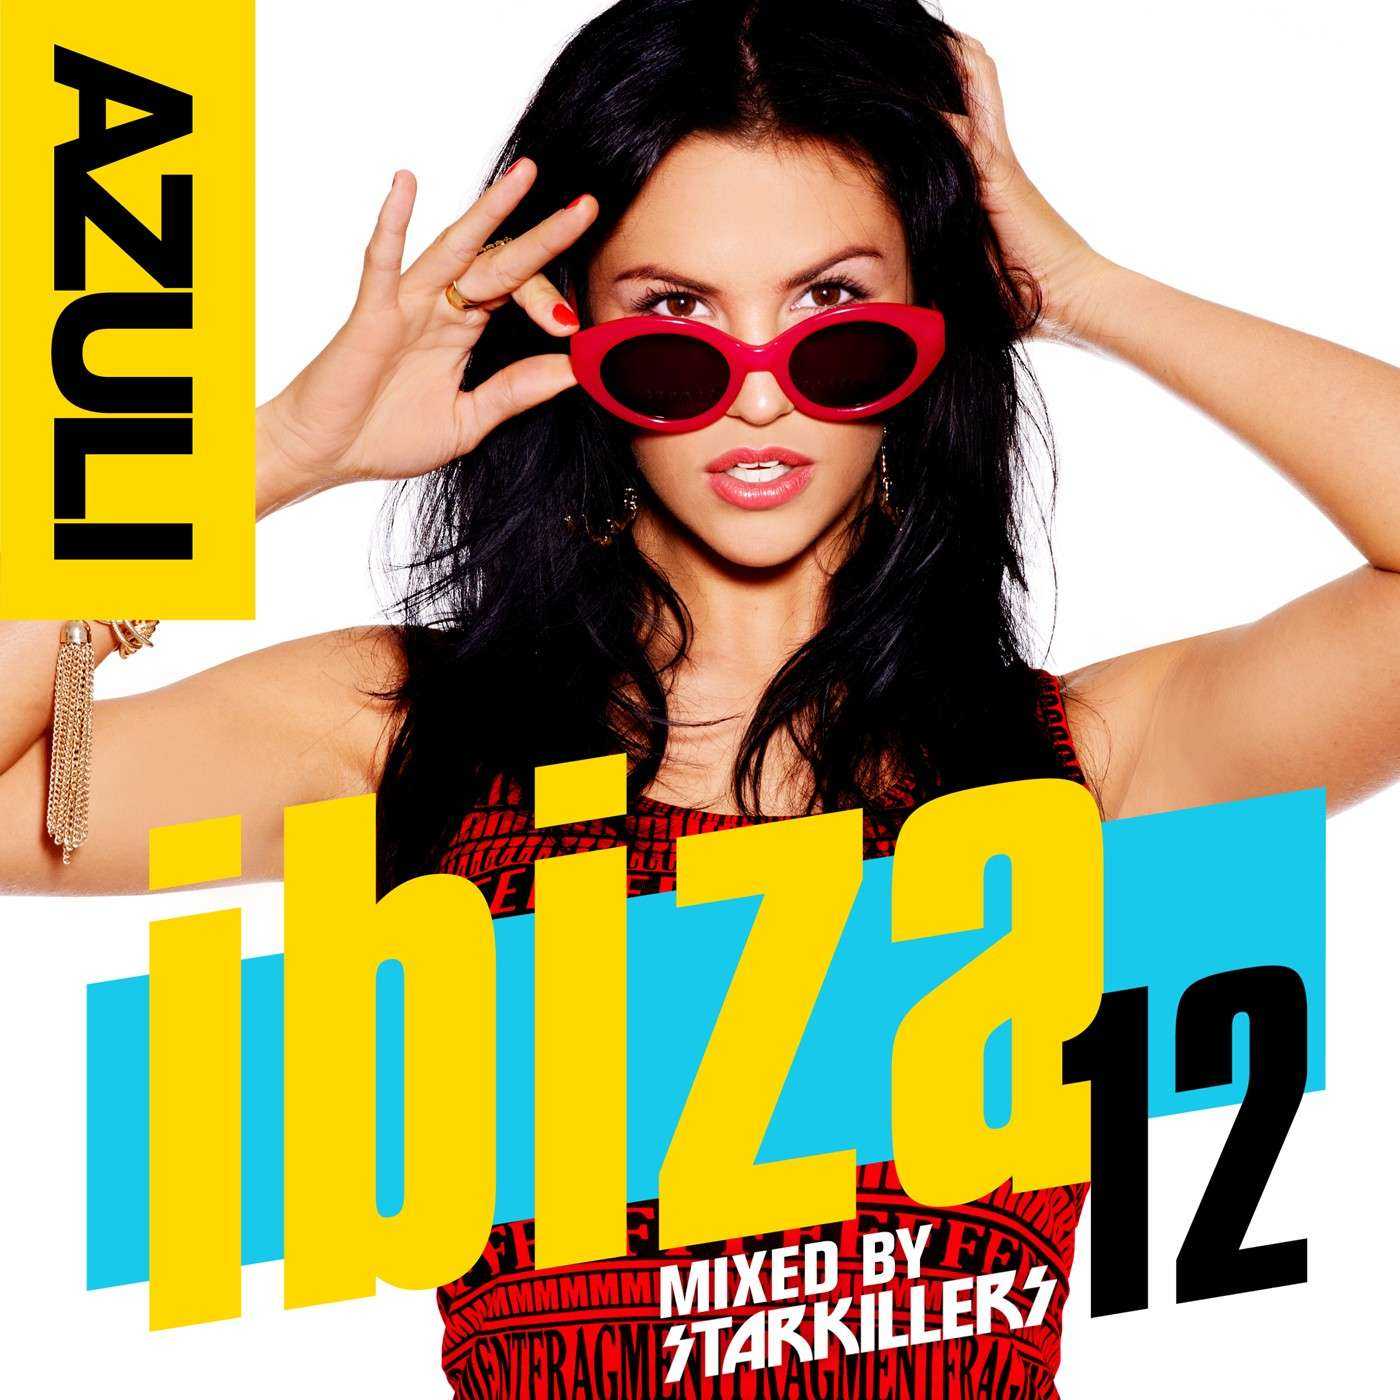 Azuli Ibiza '12 mixed by Starkillers (Album Sampler)